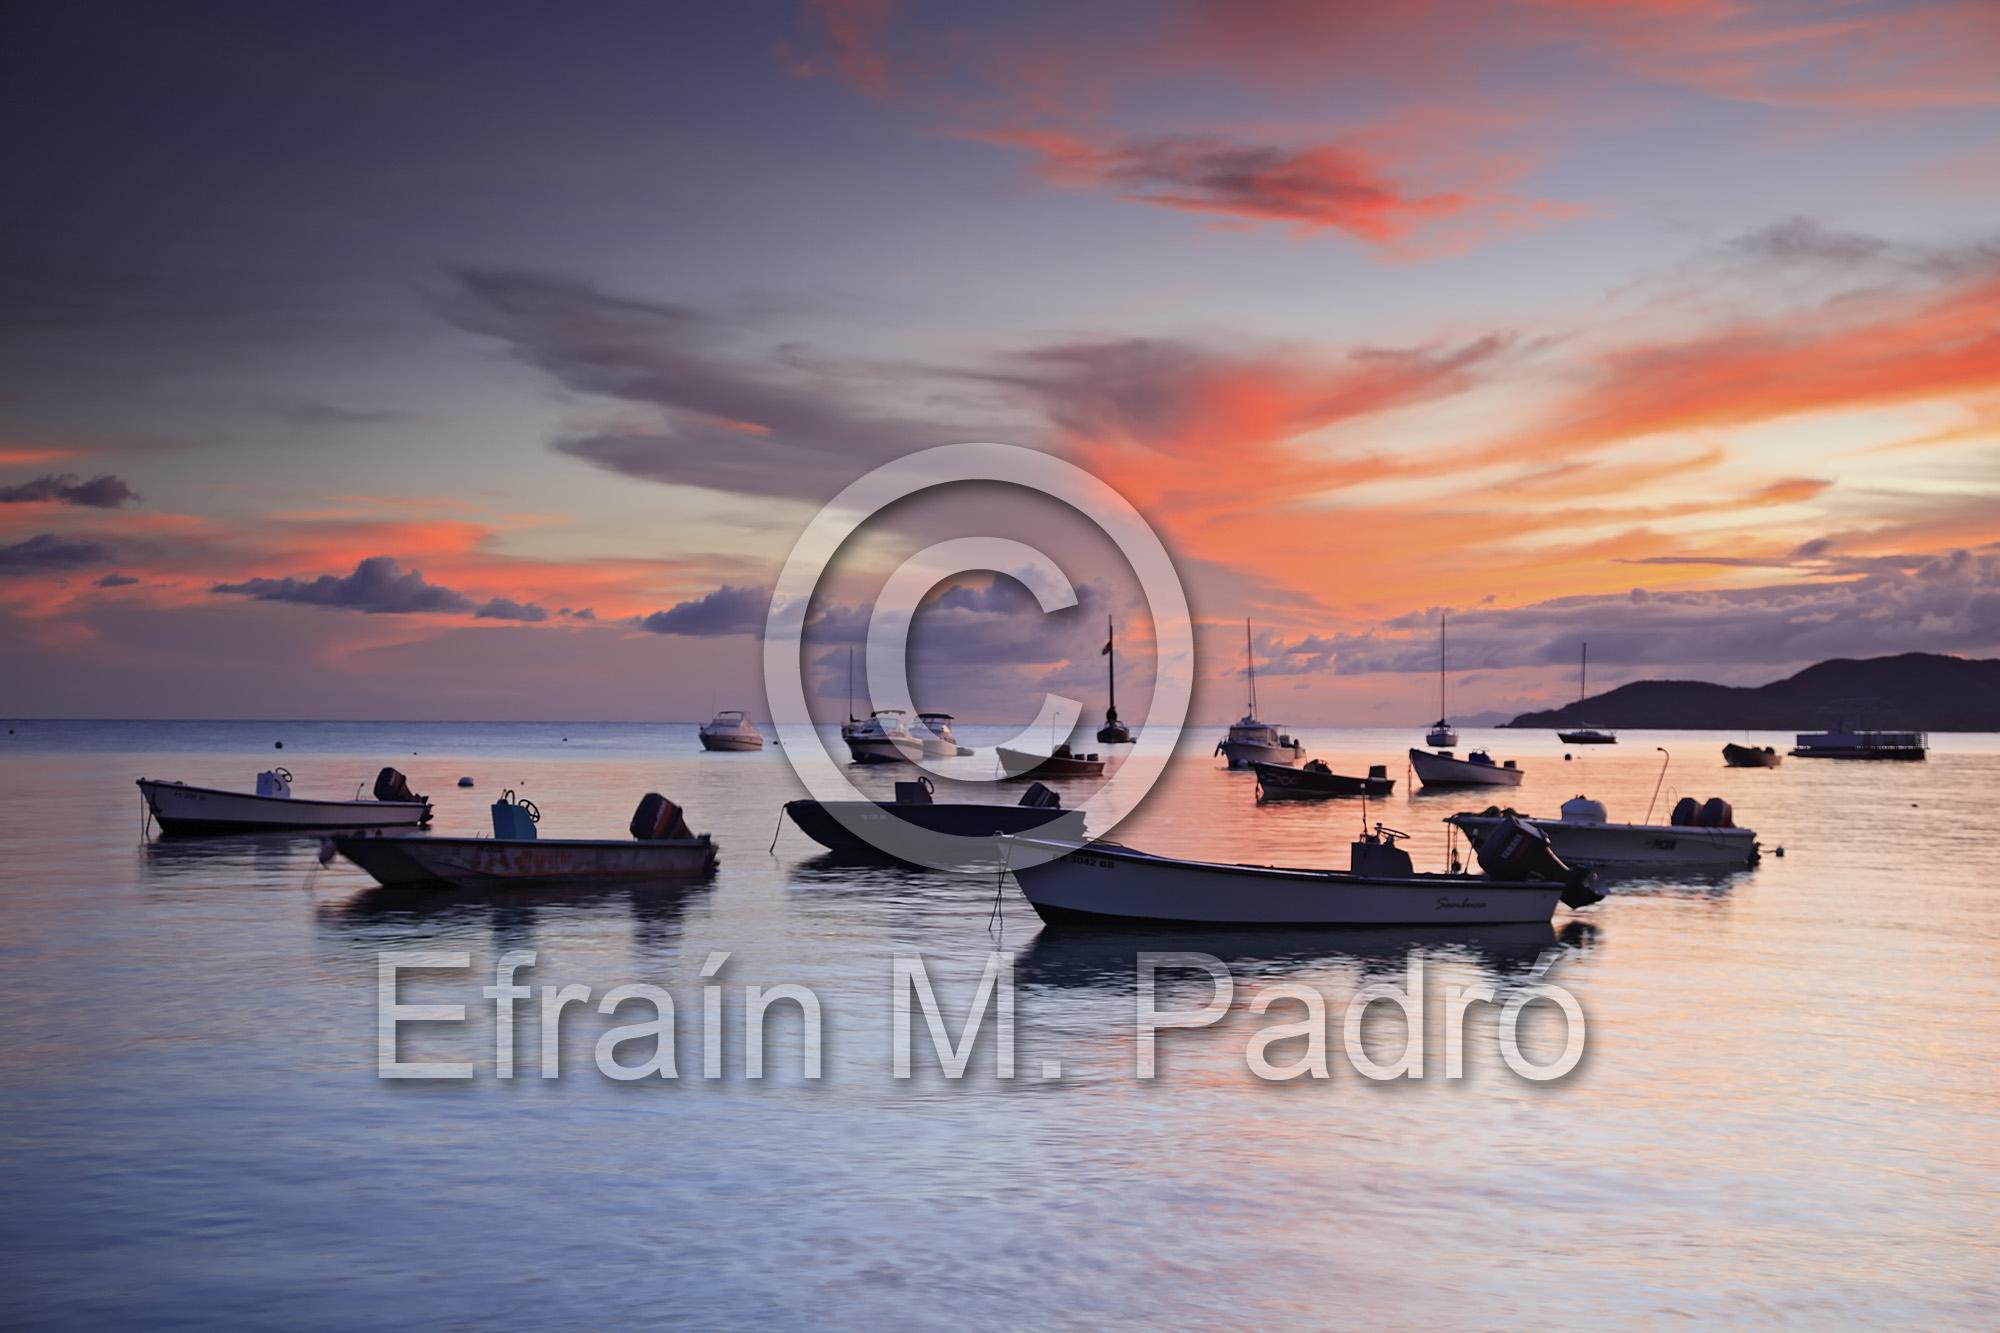 Fishing boats at sunset, Esperanza, Vieques, Puerto Rico